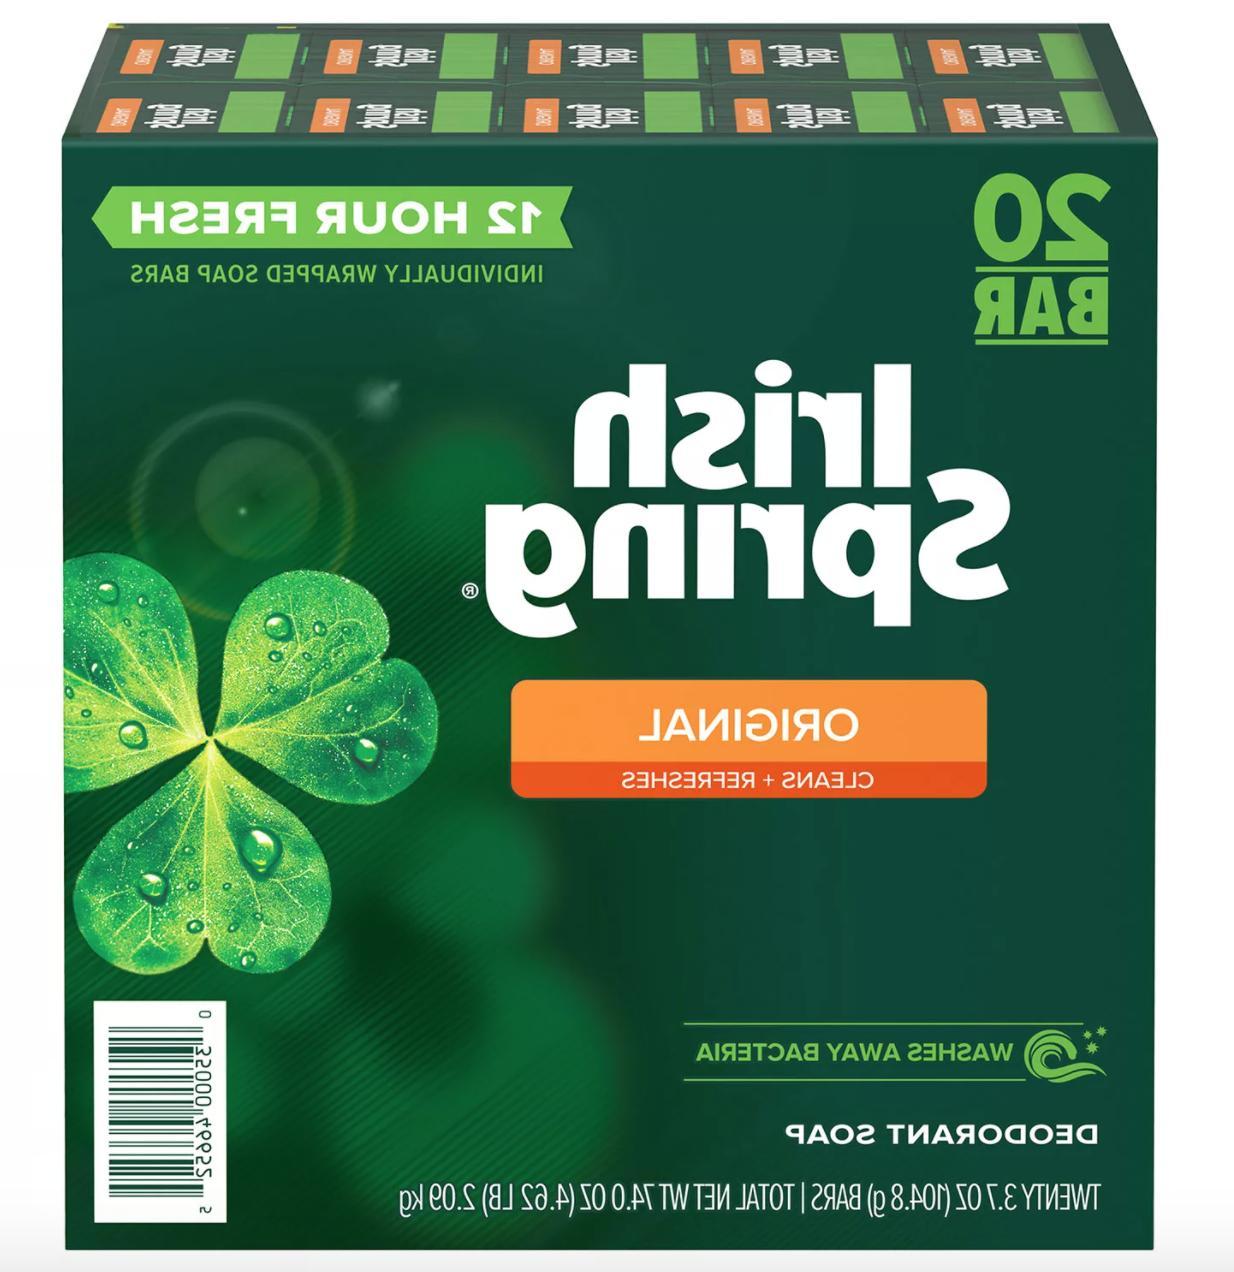 20 bar irish spring original deodorant soap